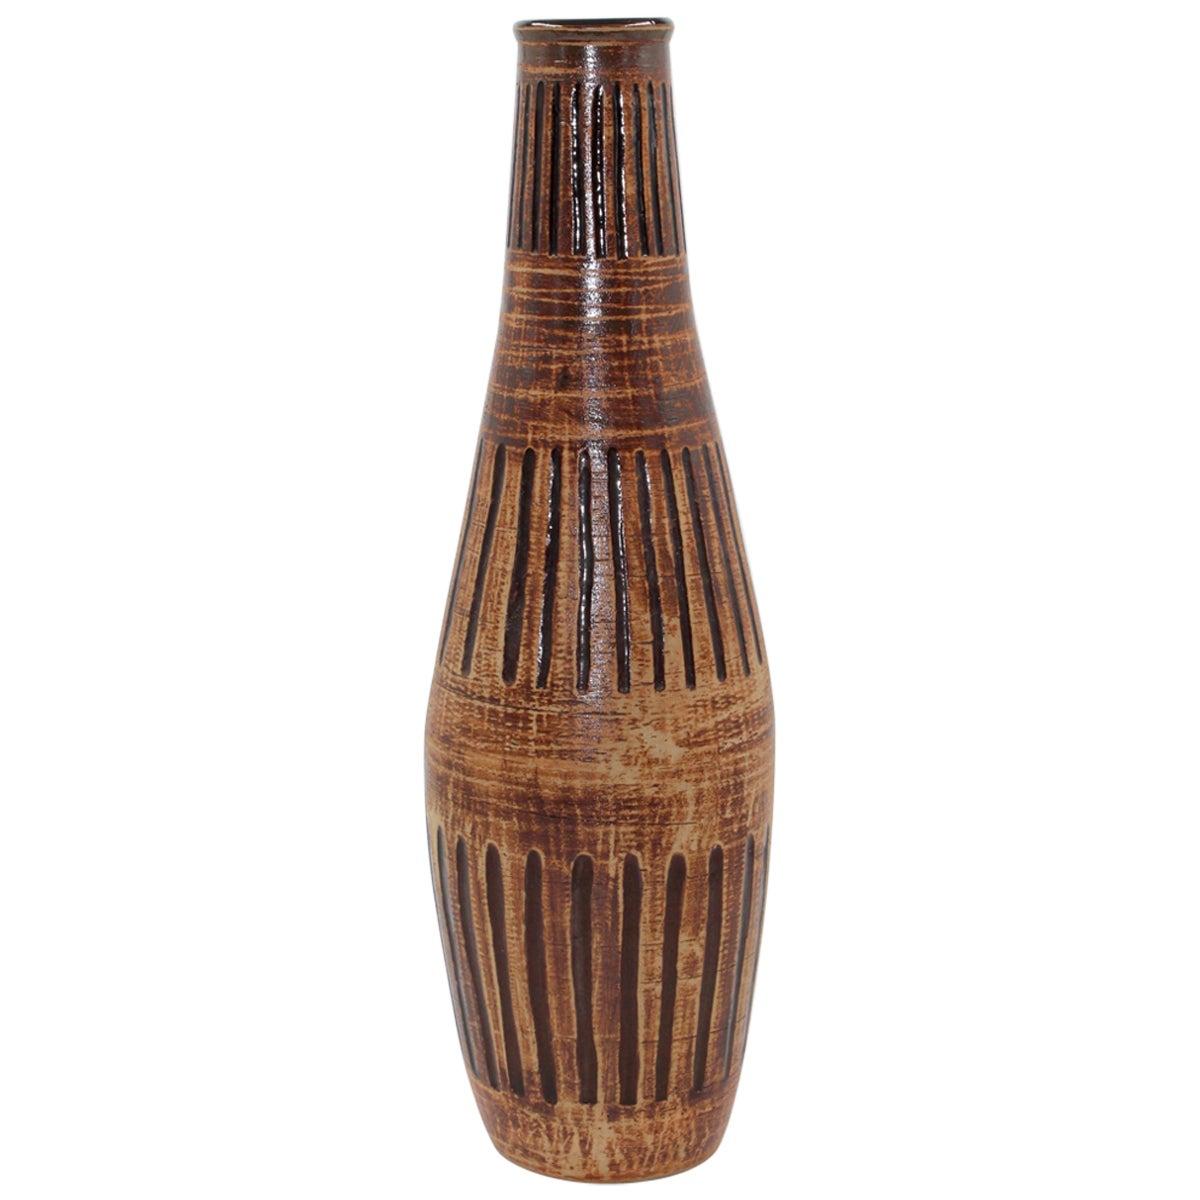 Midcentury Large Ceramic Vase by Egon Larsson for Höganäs Keramik